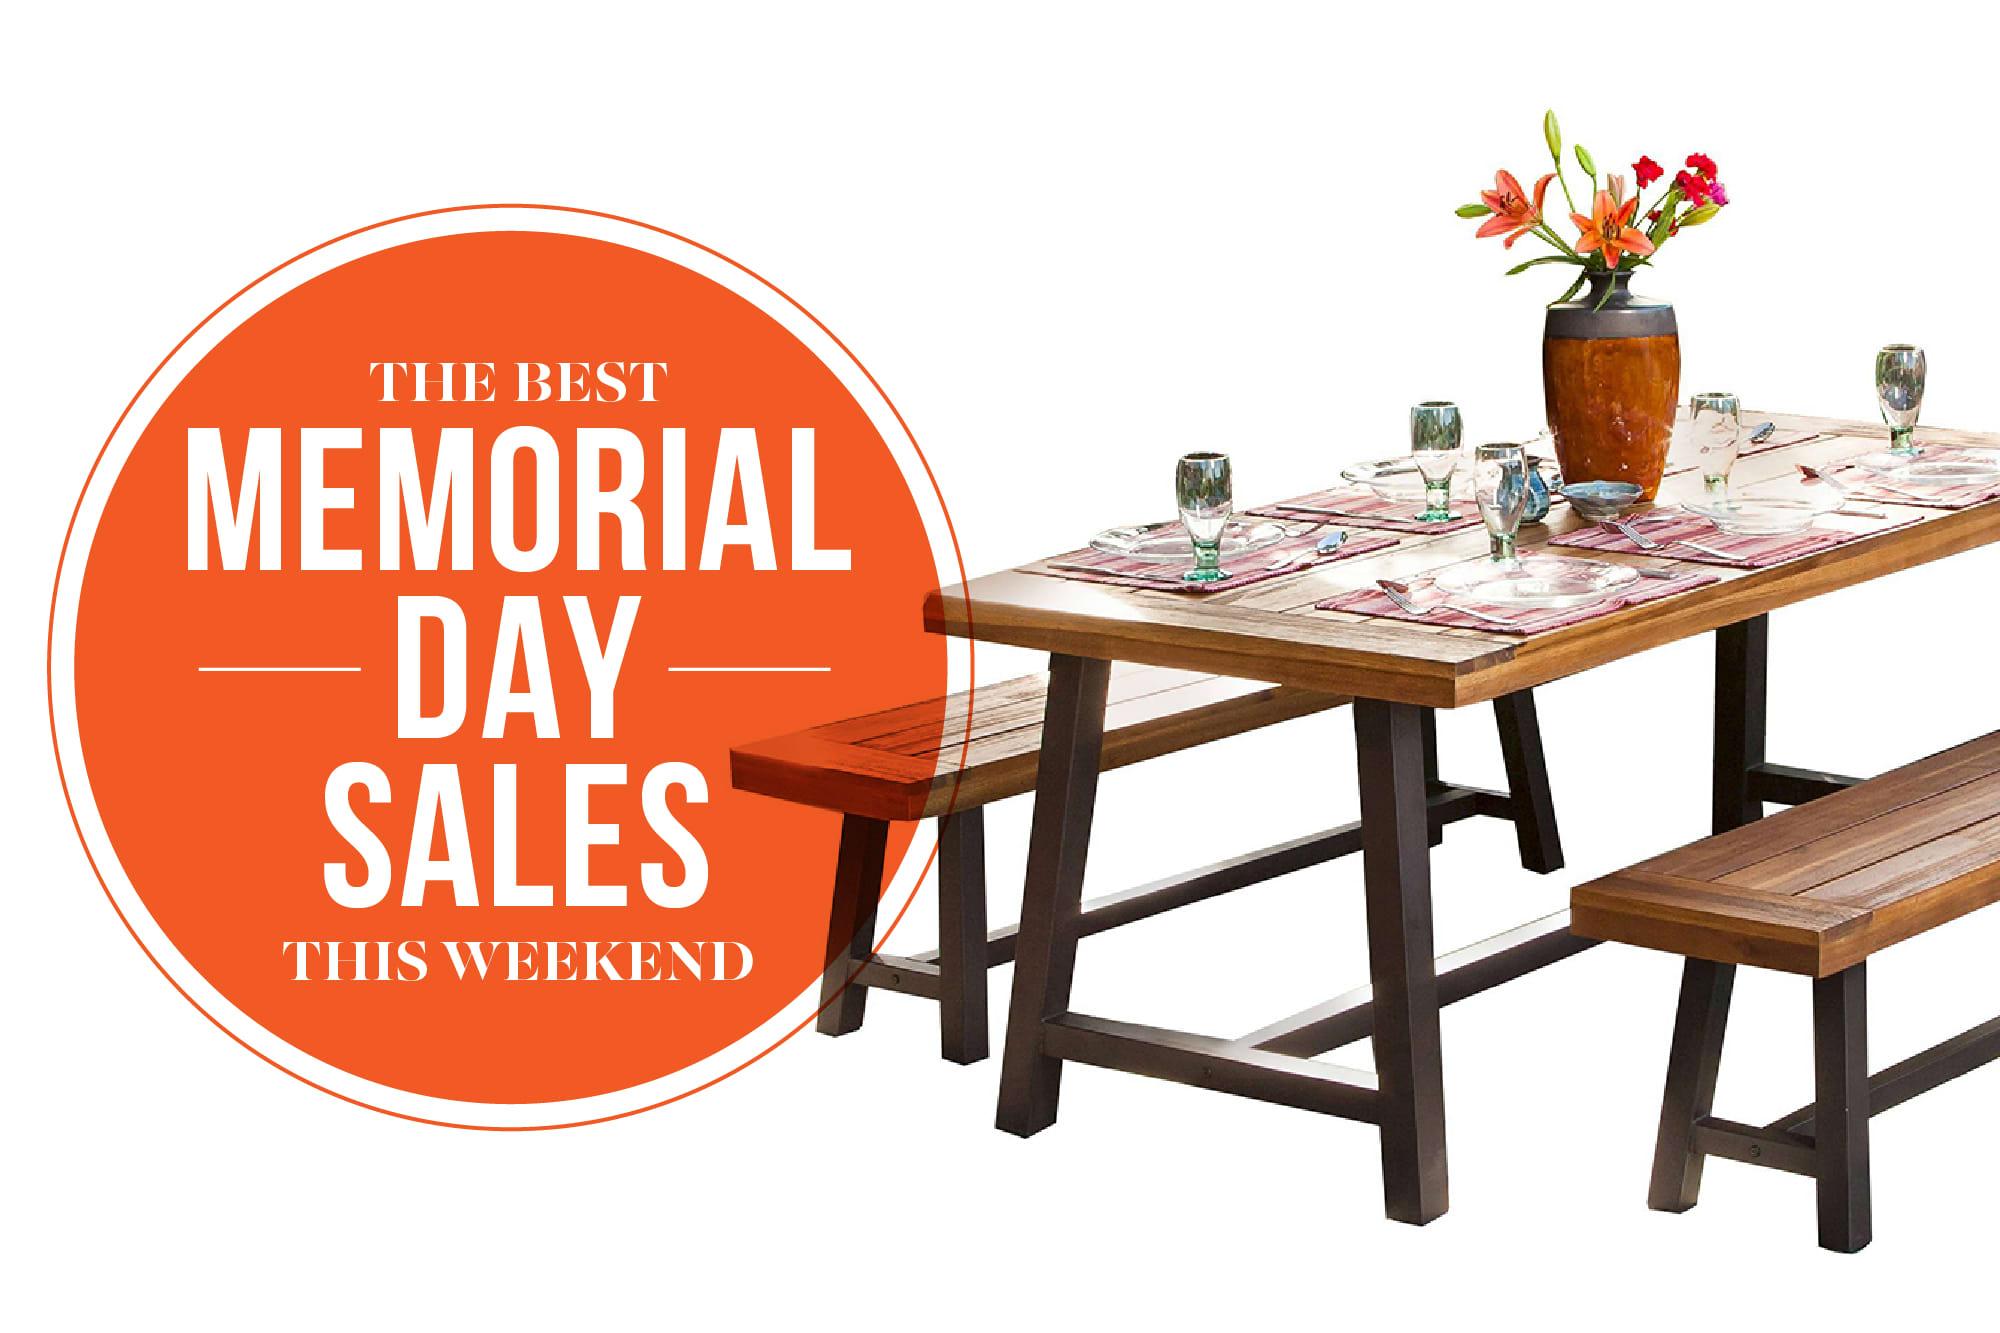 The Best Memorial Day Sales Happening This Weekend: gallery image 1